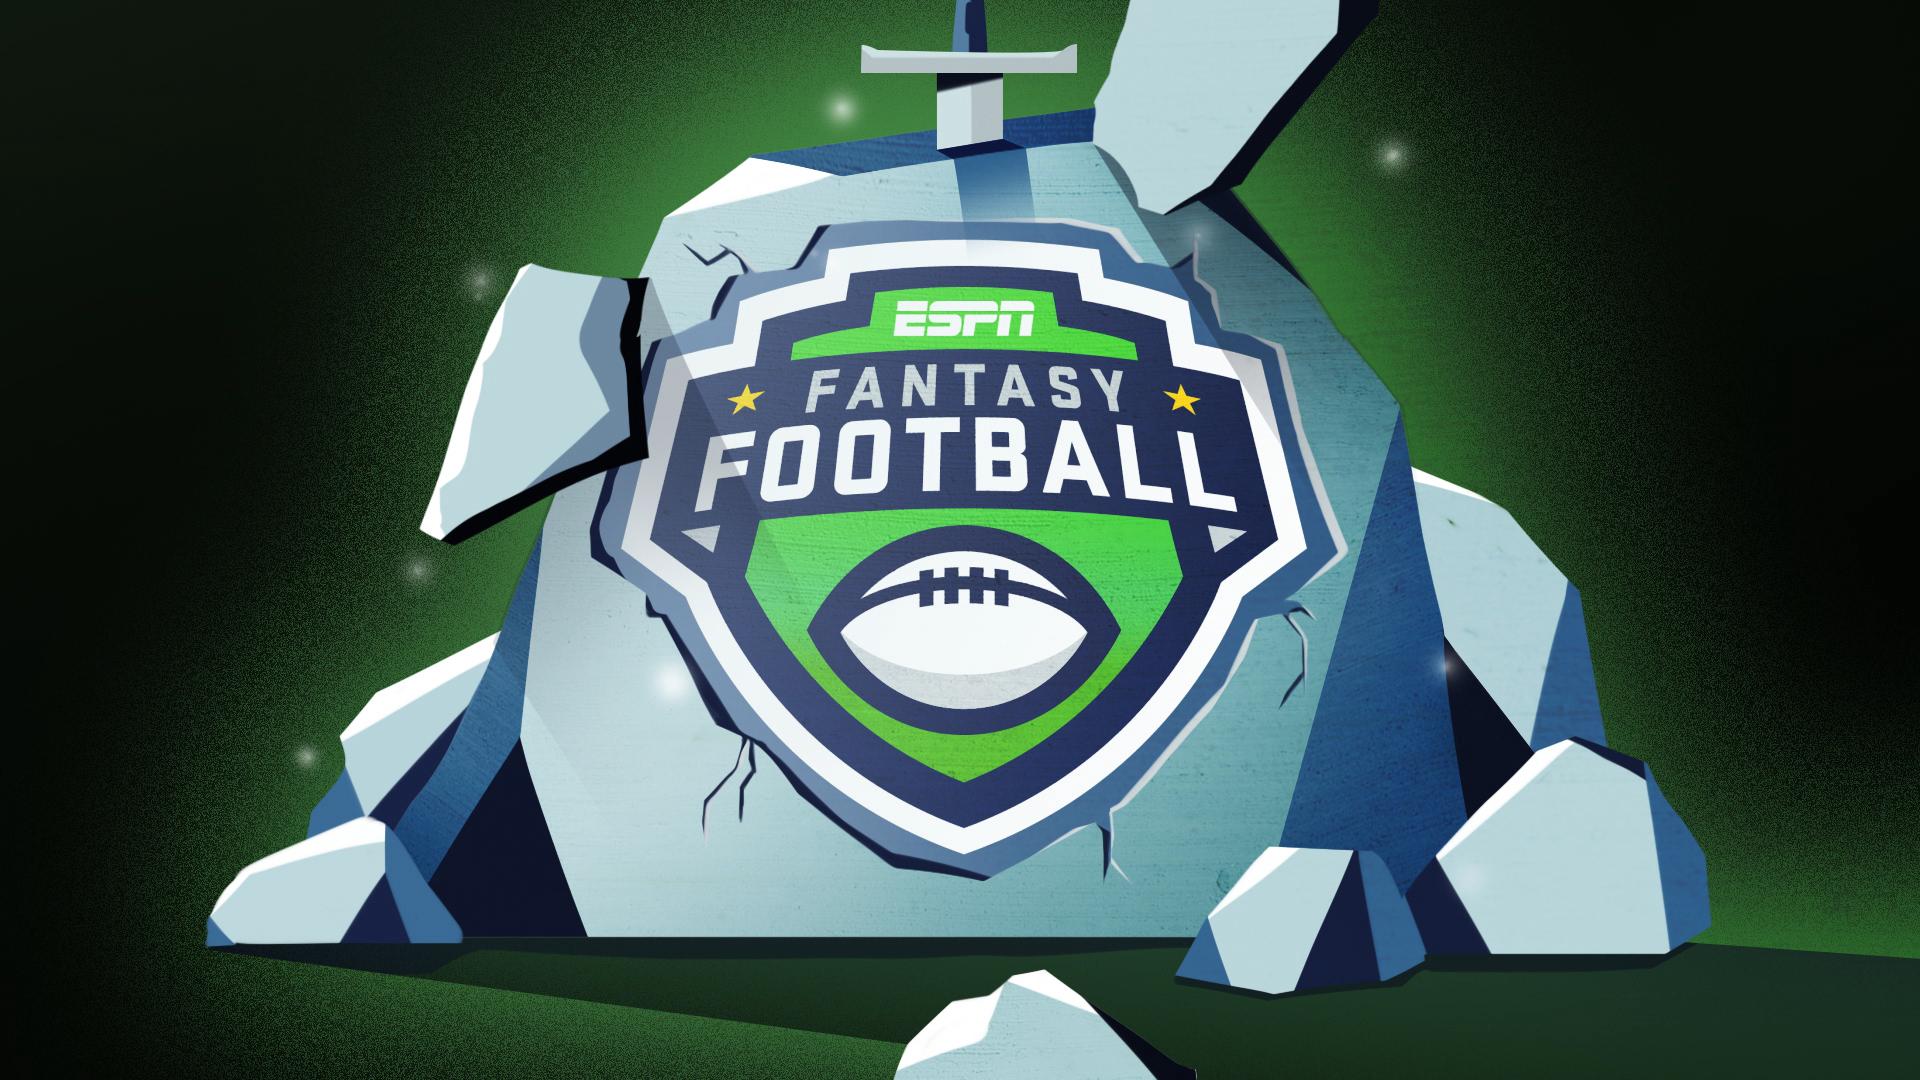 NFL_Belichick_30_A_Digital_07.jpg